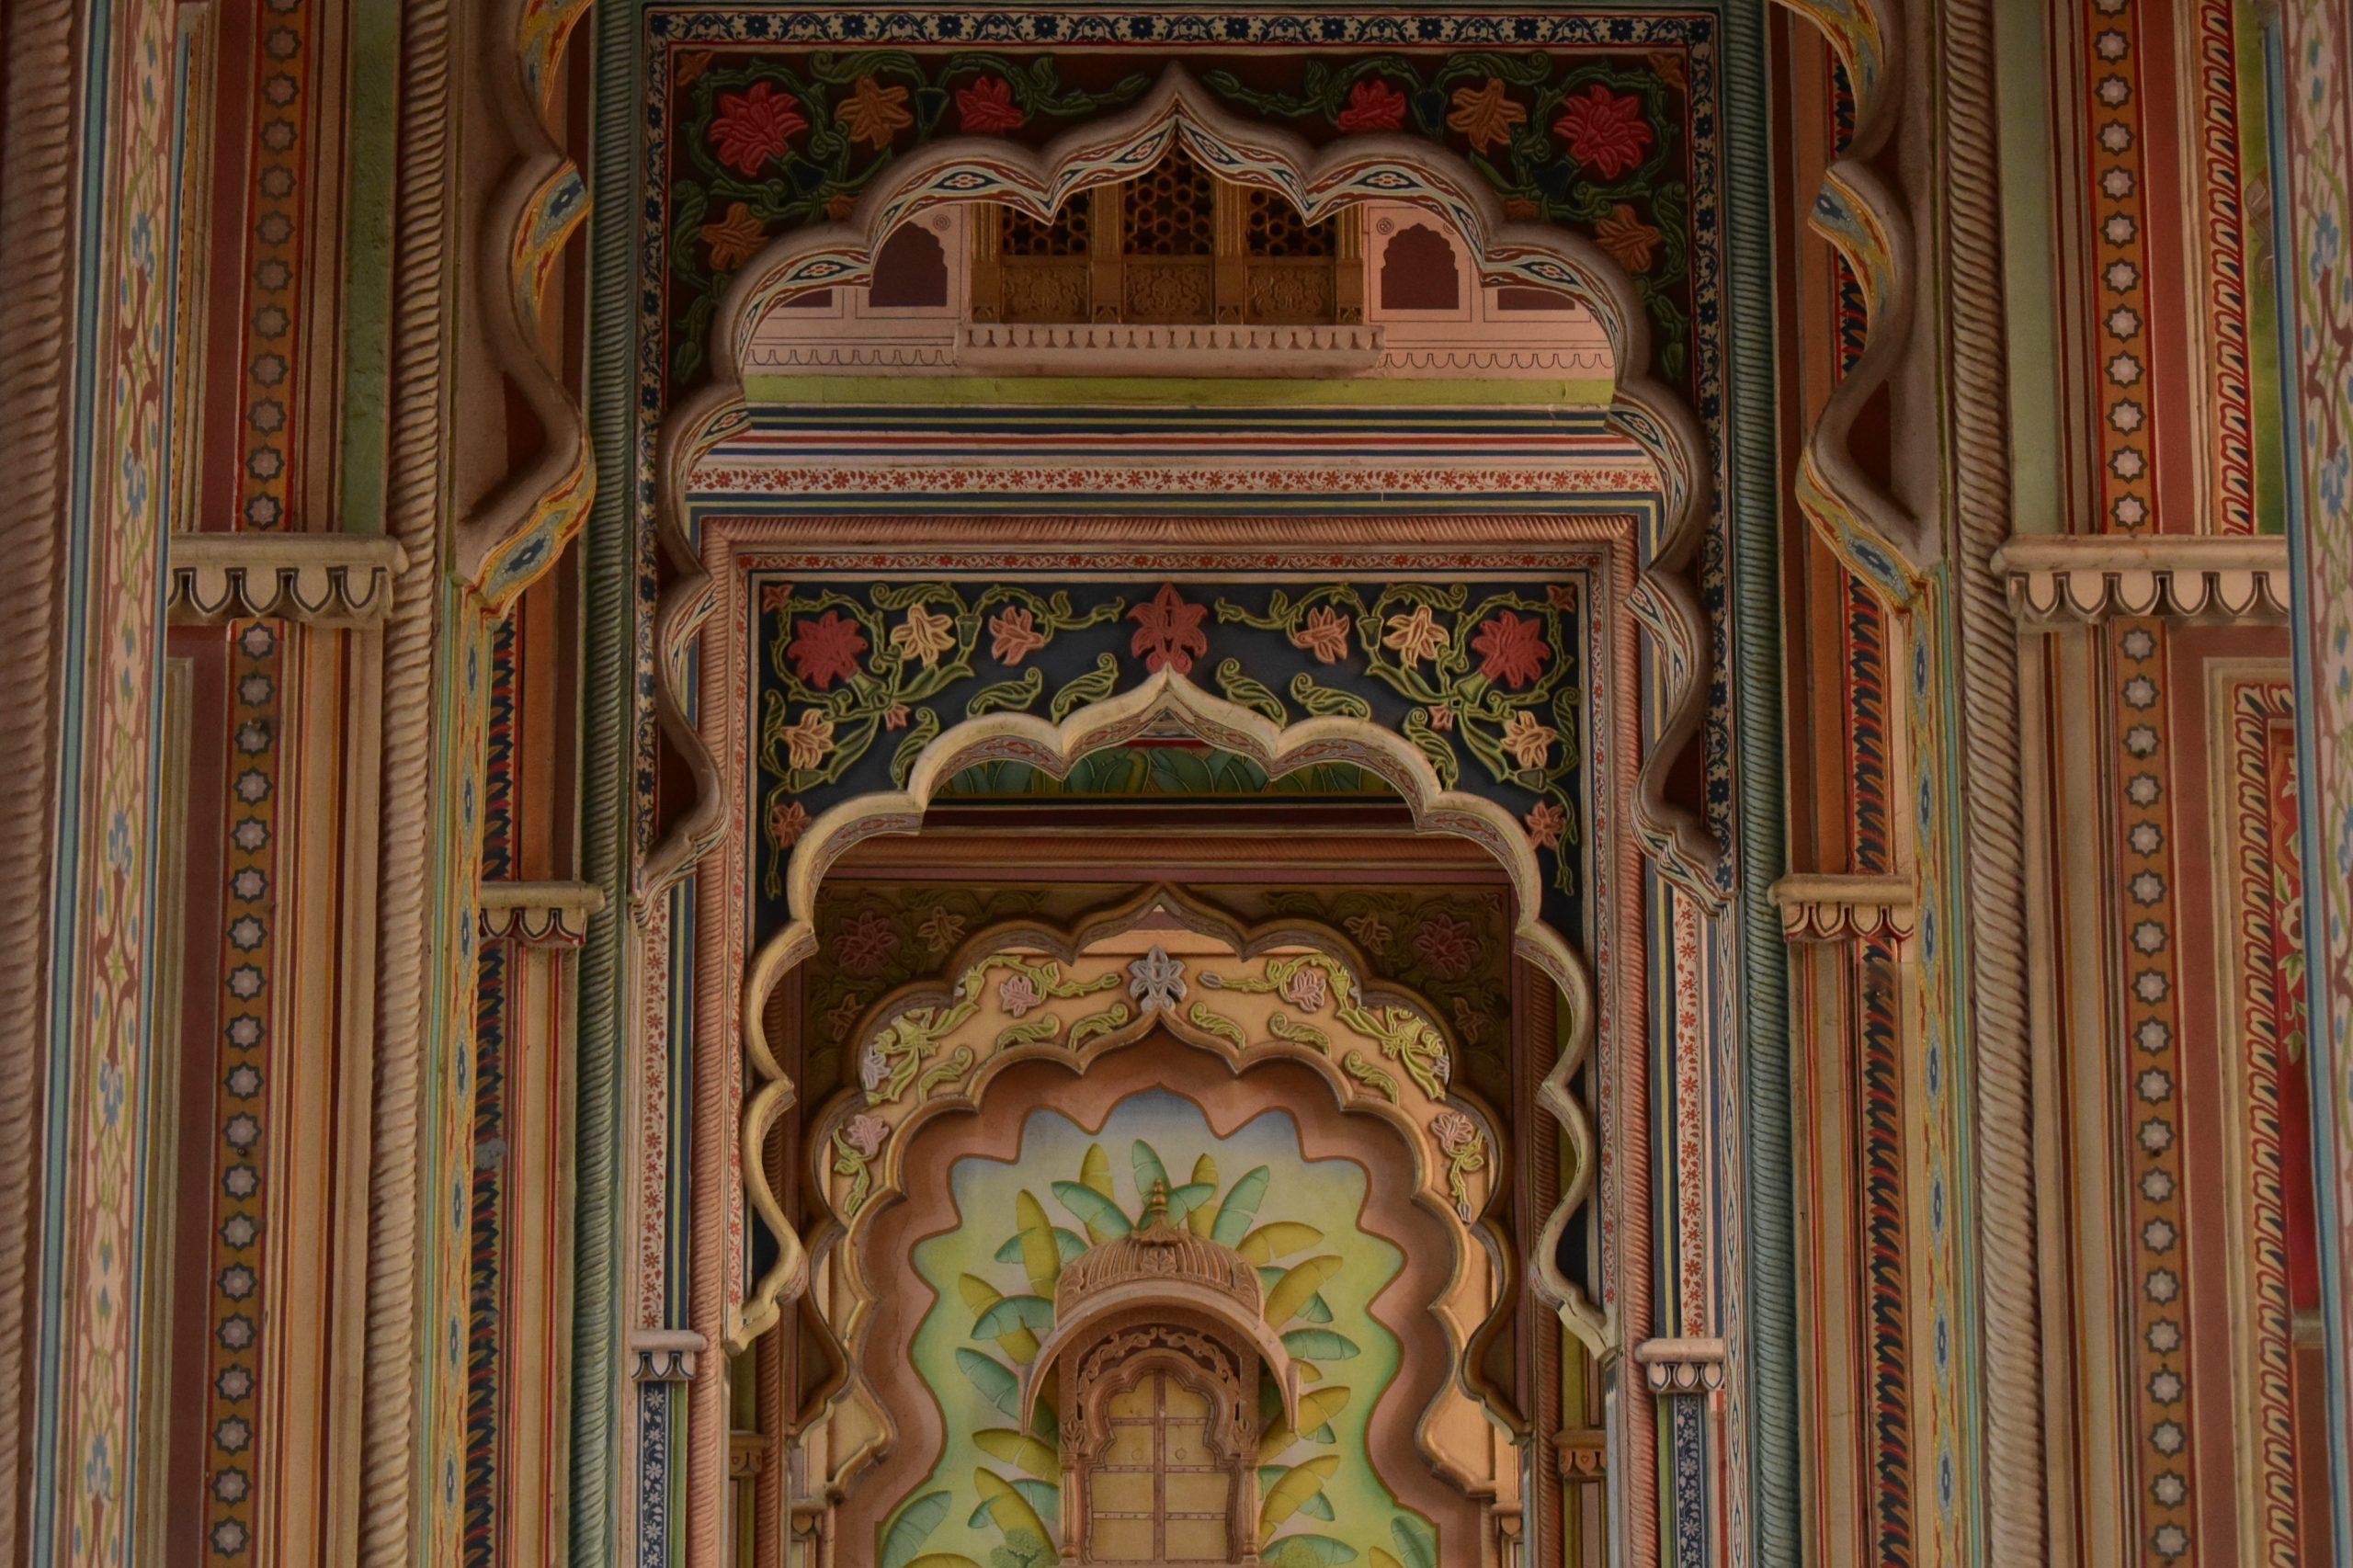 Art at Patrika gate